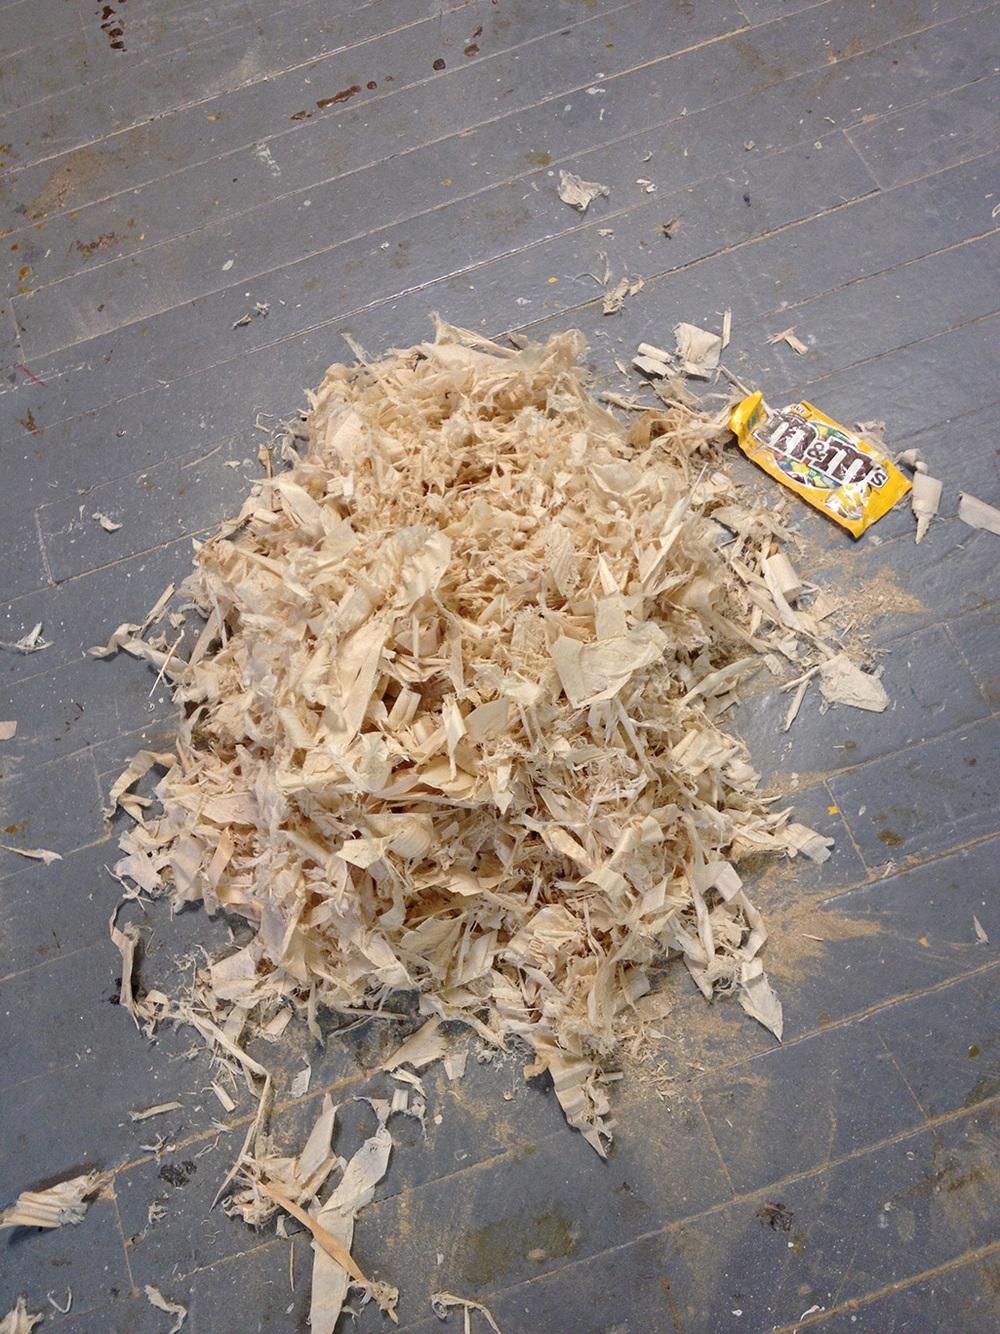 sawdust_1025.jpg